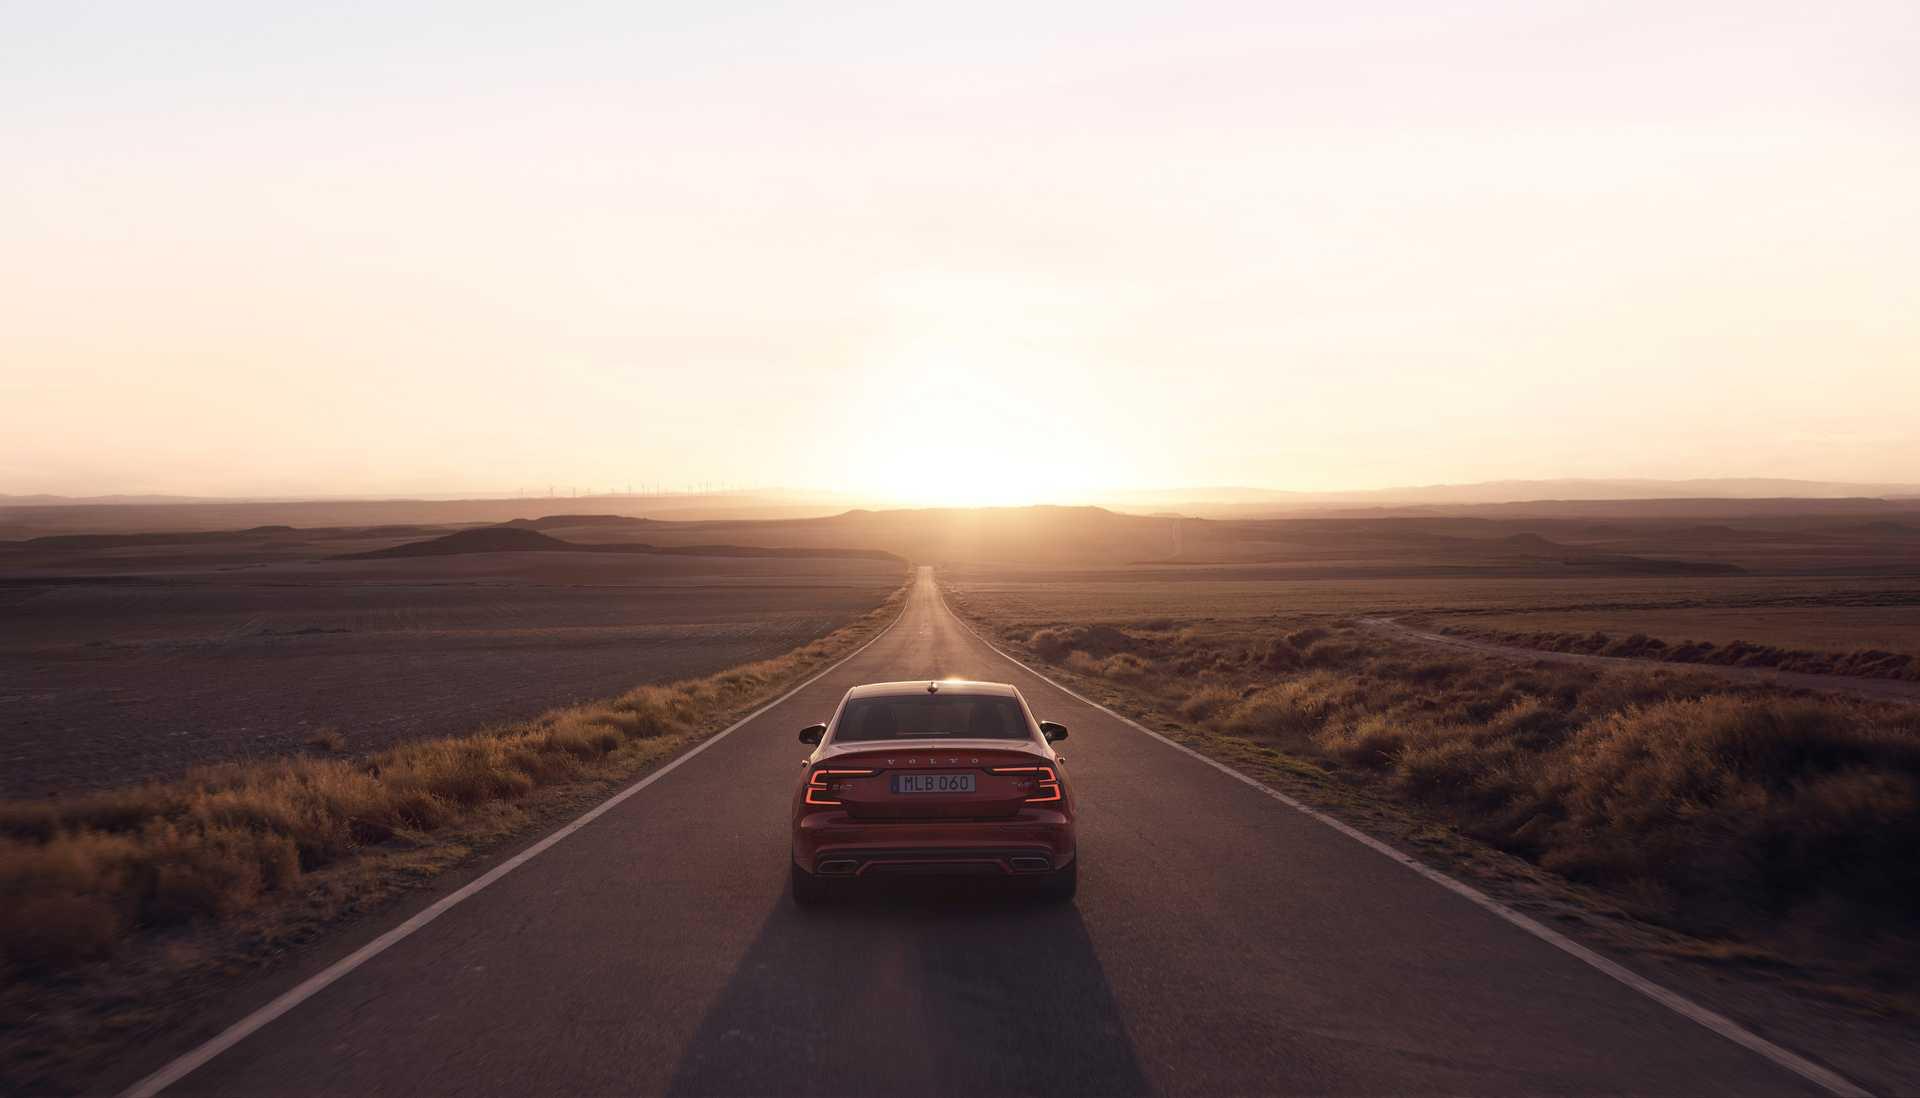 Volvo S60 T6 TwEn AWD Geartronic, 340hp, 2019